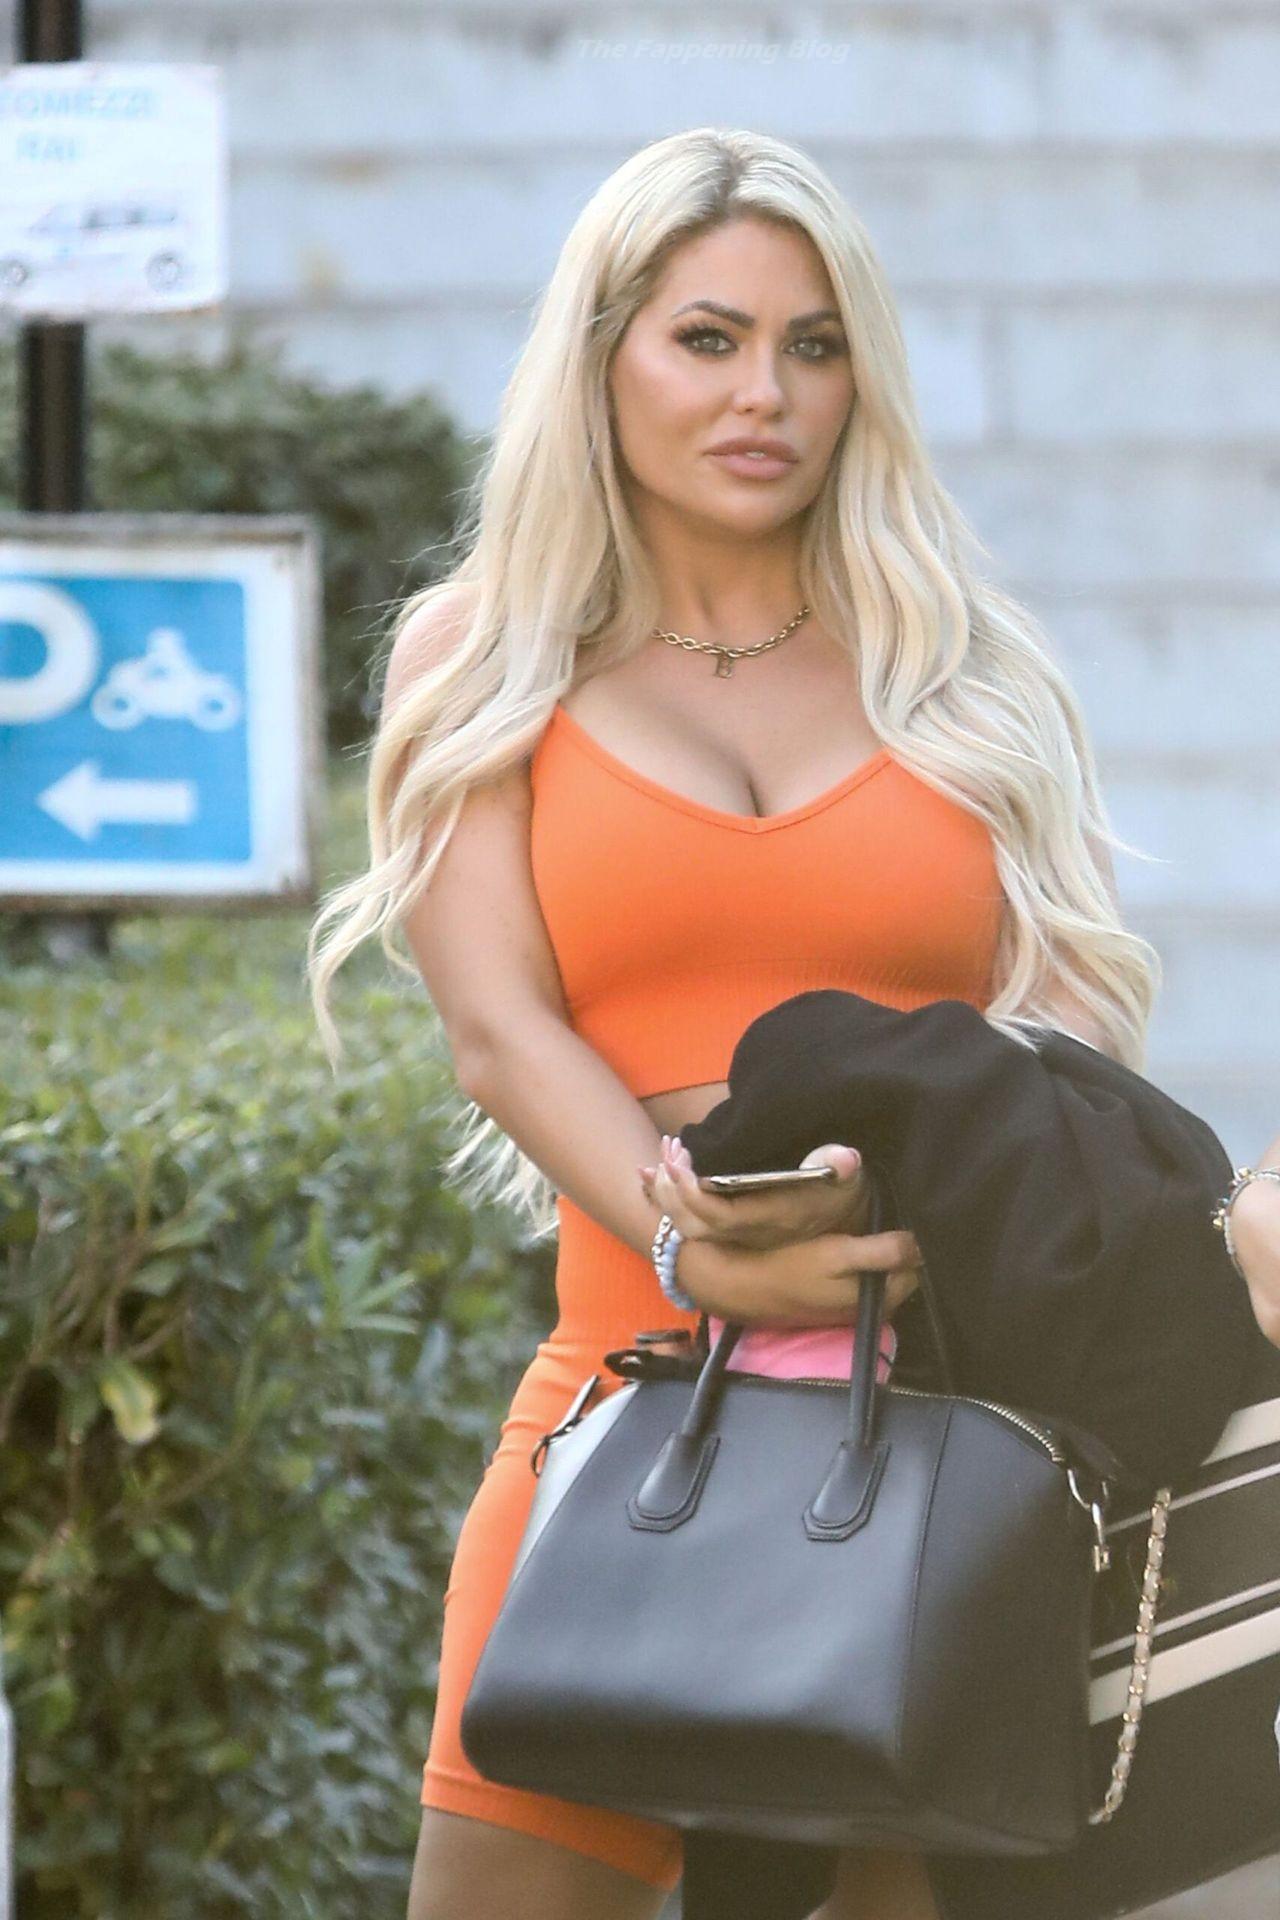 Bianca-Gascoigne-Sexy-Big-Ass-and-Boobs-6-scaled1-thefappeningblog.com_.jpg